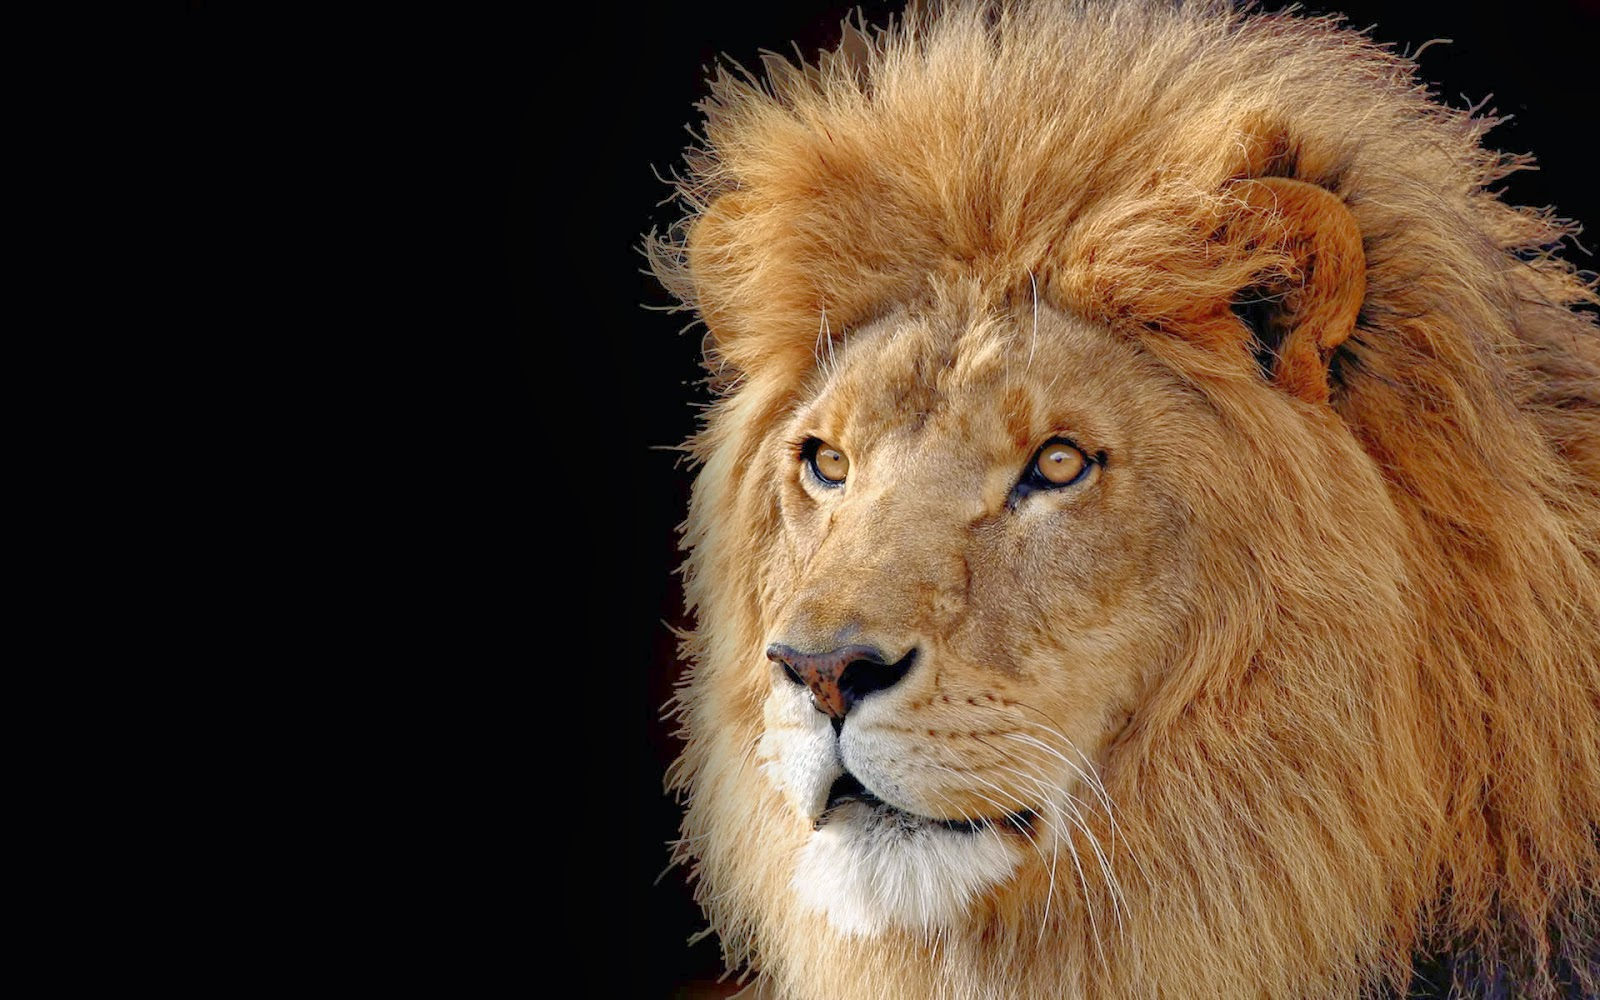 El rey de la selva 161 hasta el 218 ltimo suspiro quot el blog de ro quot